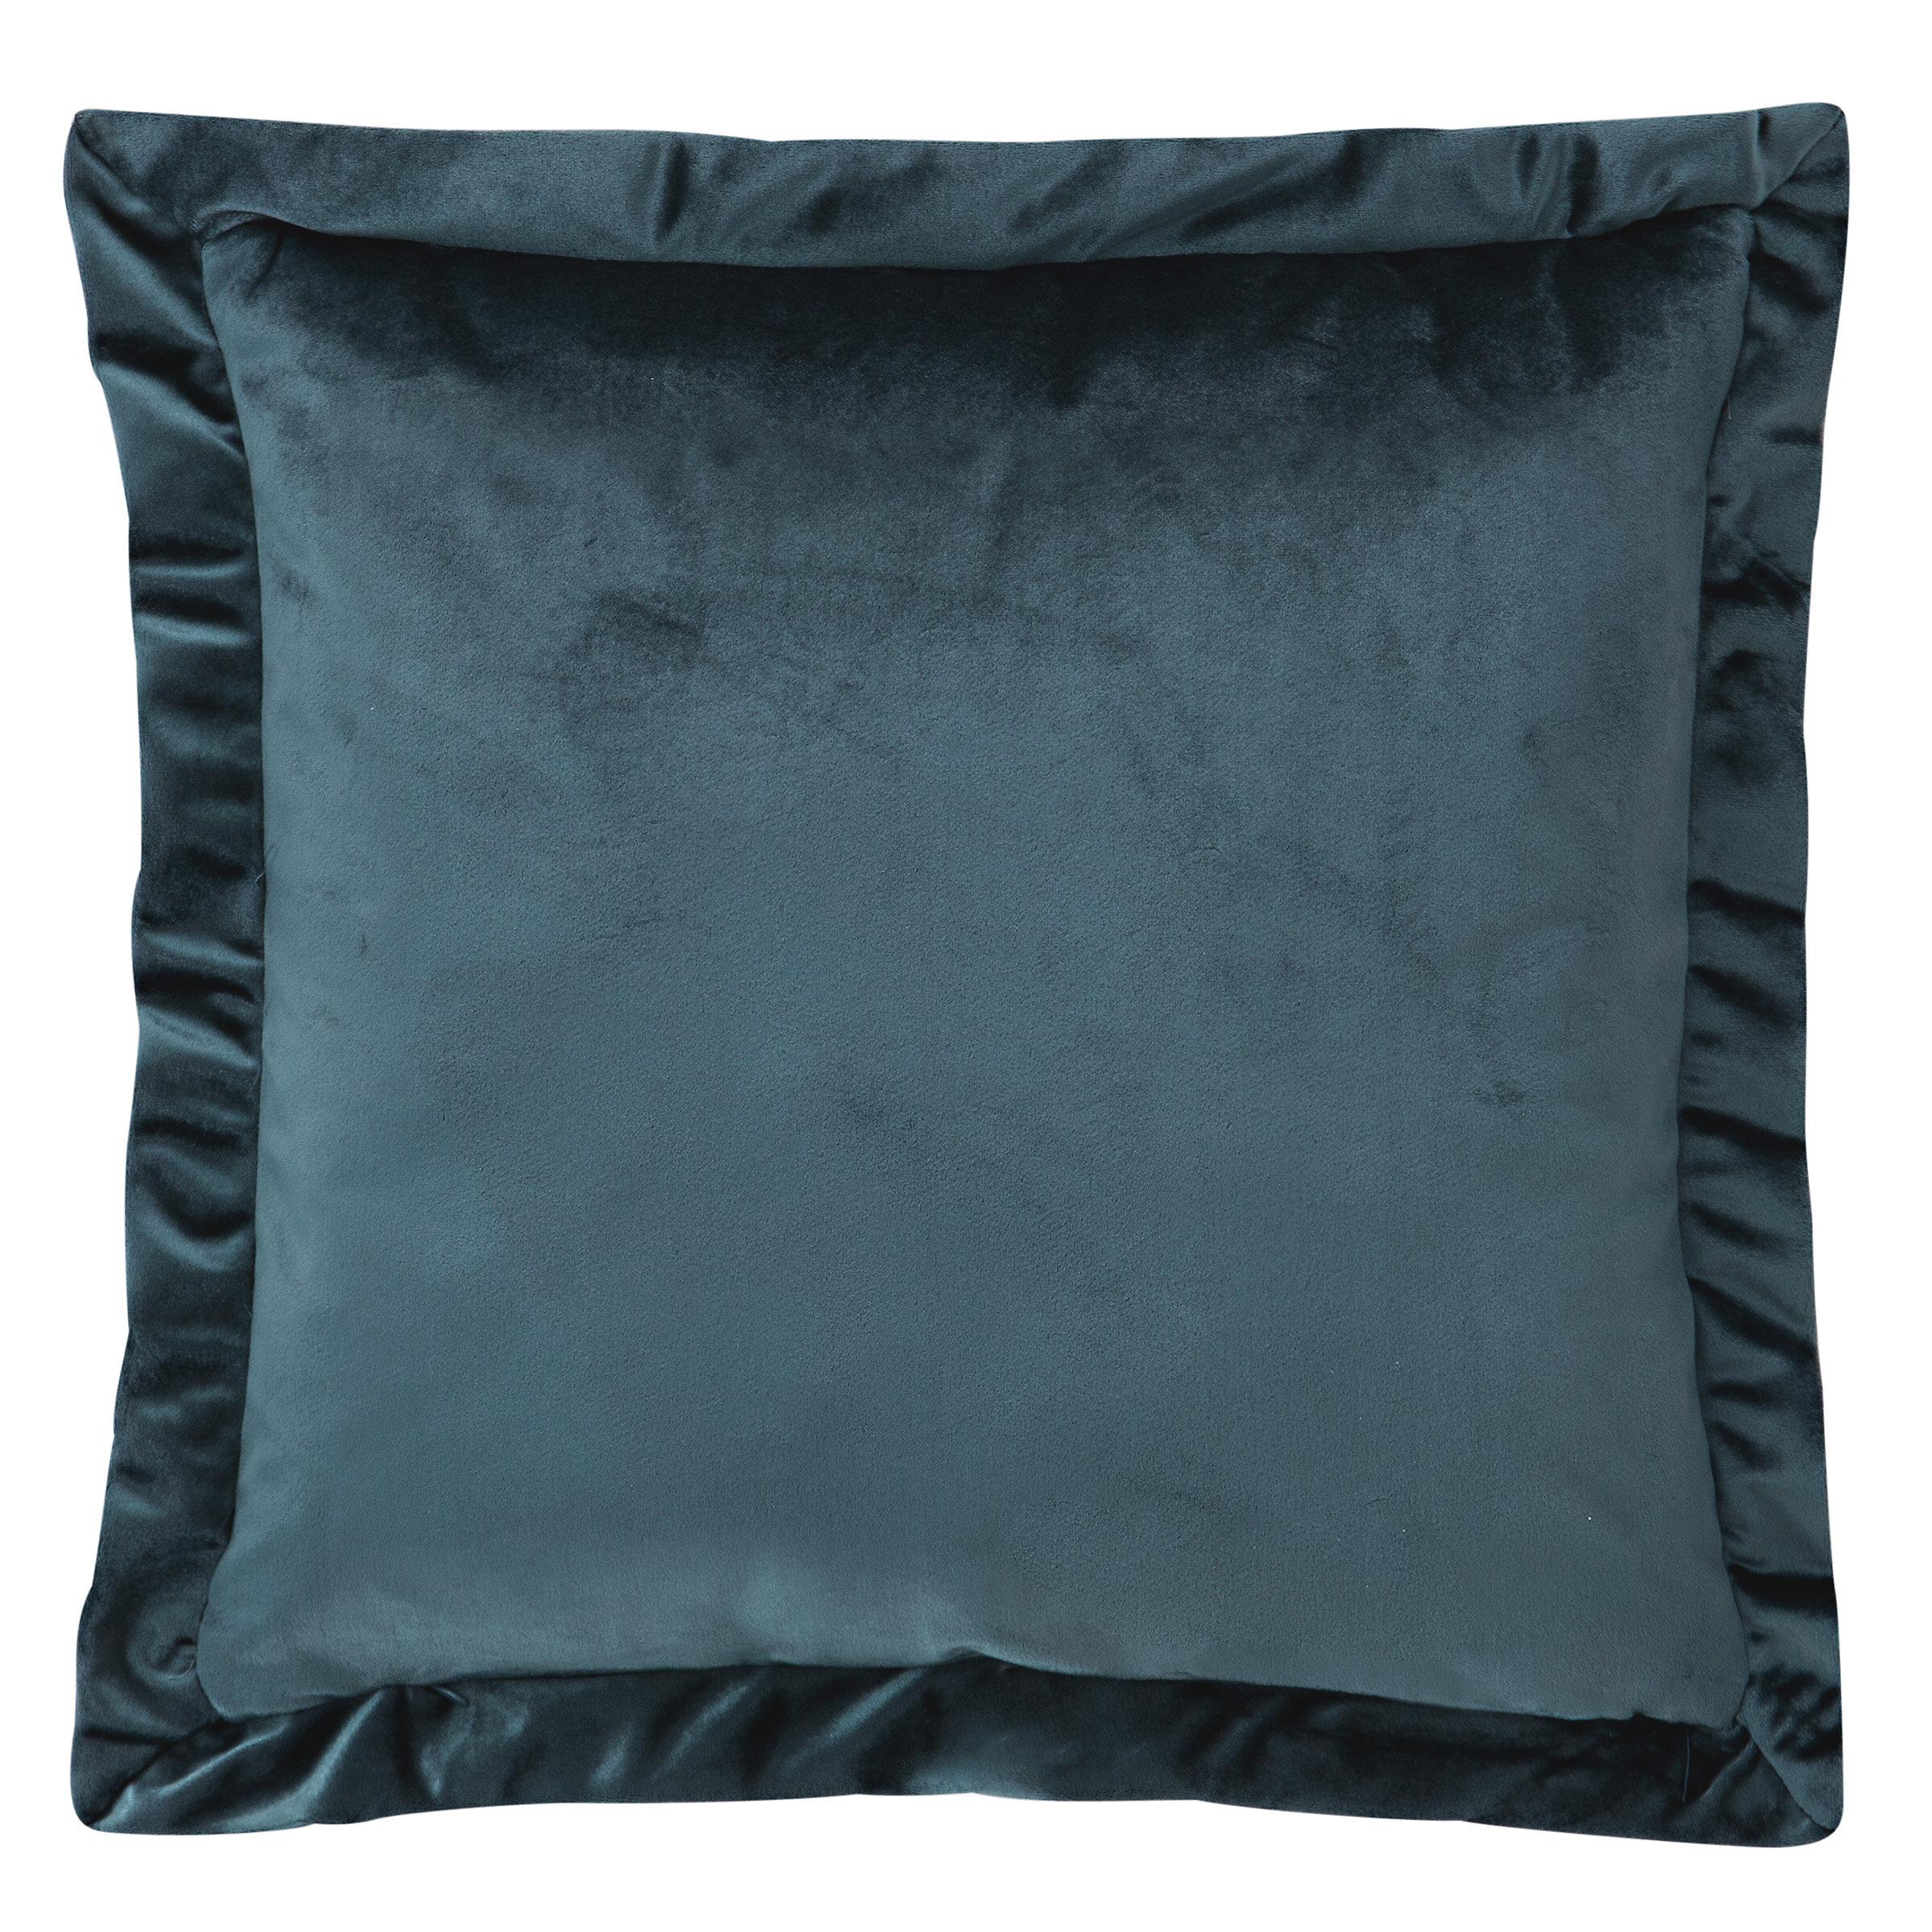 Blue Waterford Bedding Throw Pillows You Ll Love In 2021 Wayfair